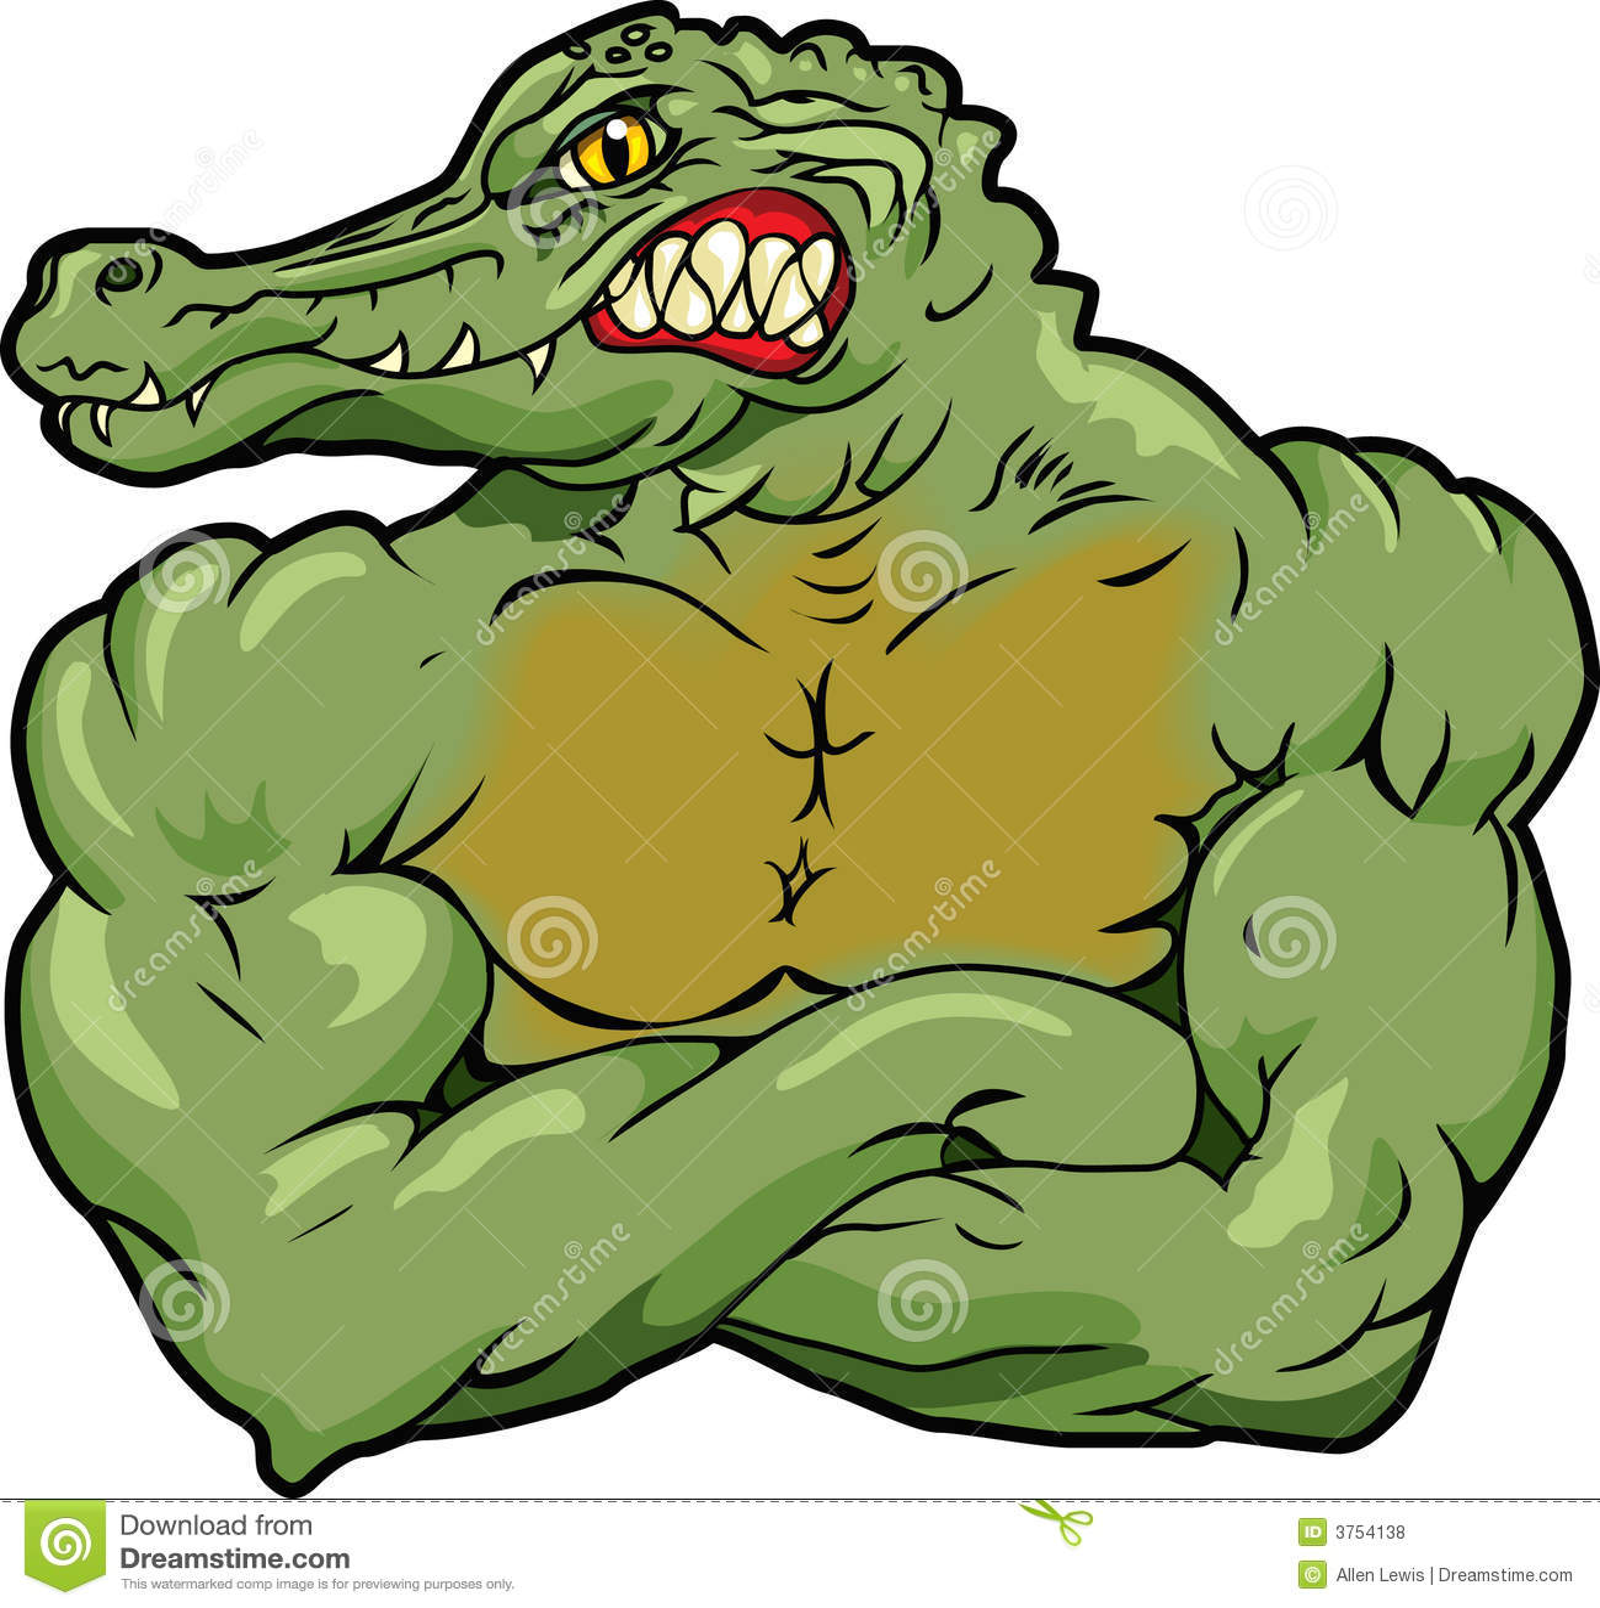 Gator Royalty Free Stock Photos - Image: 3754138